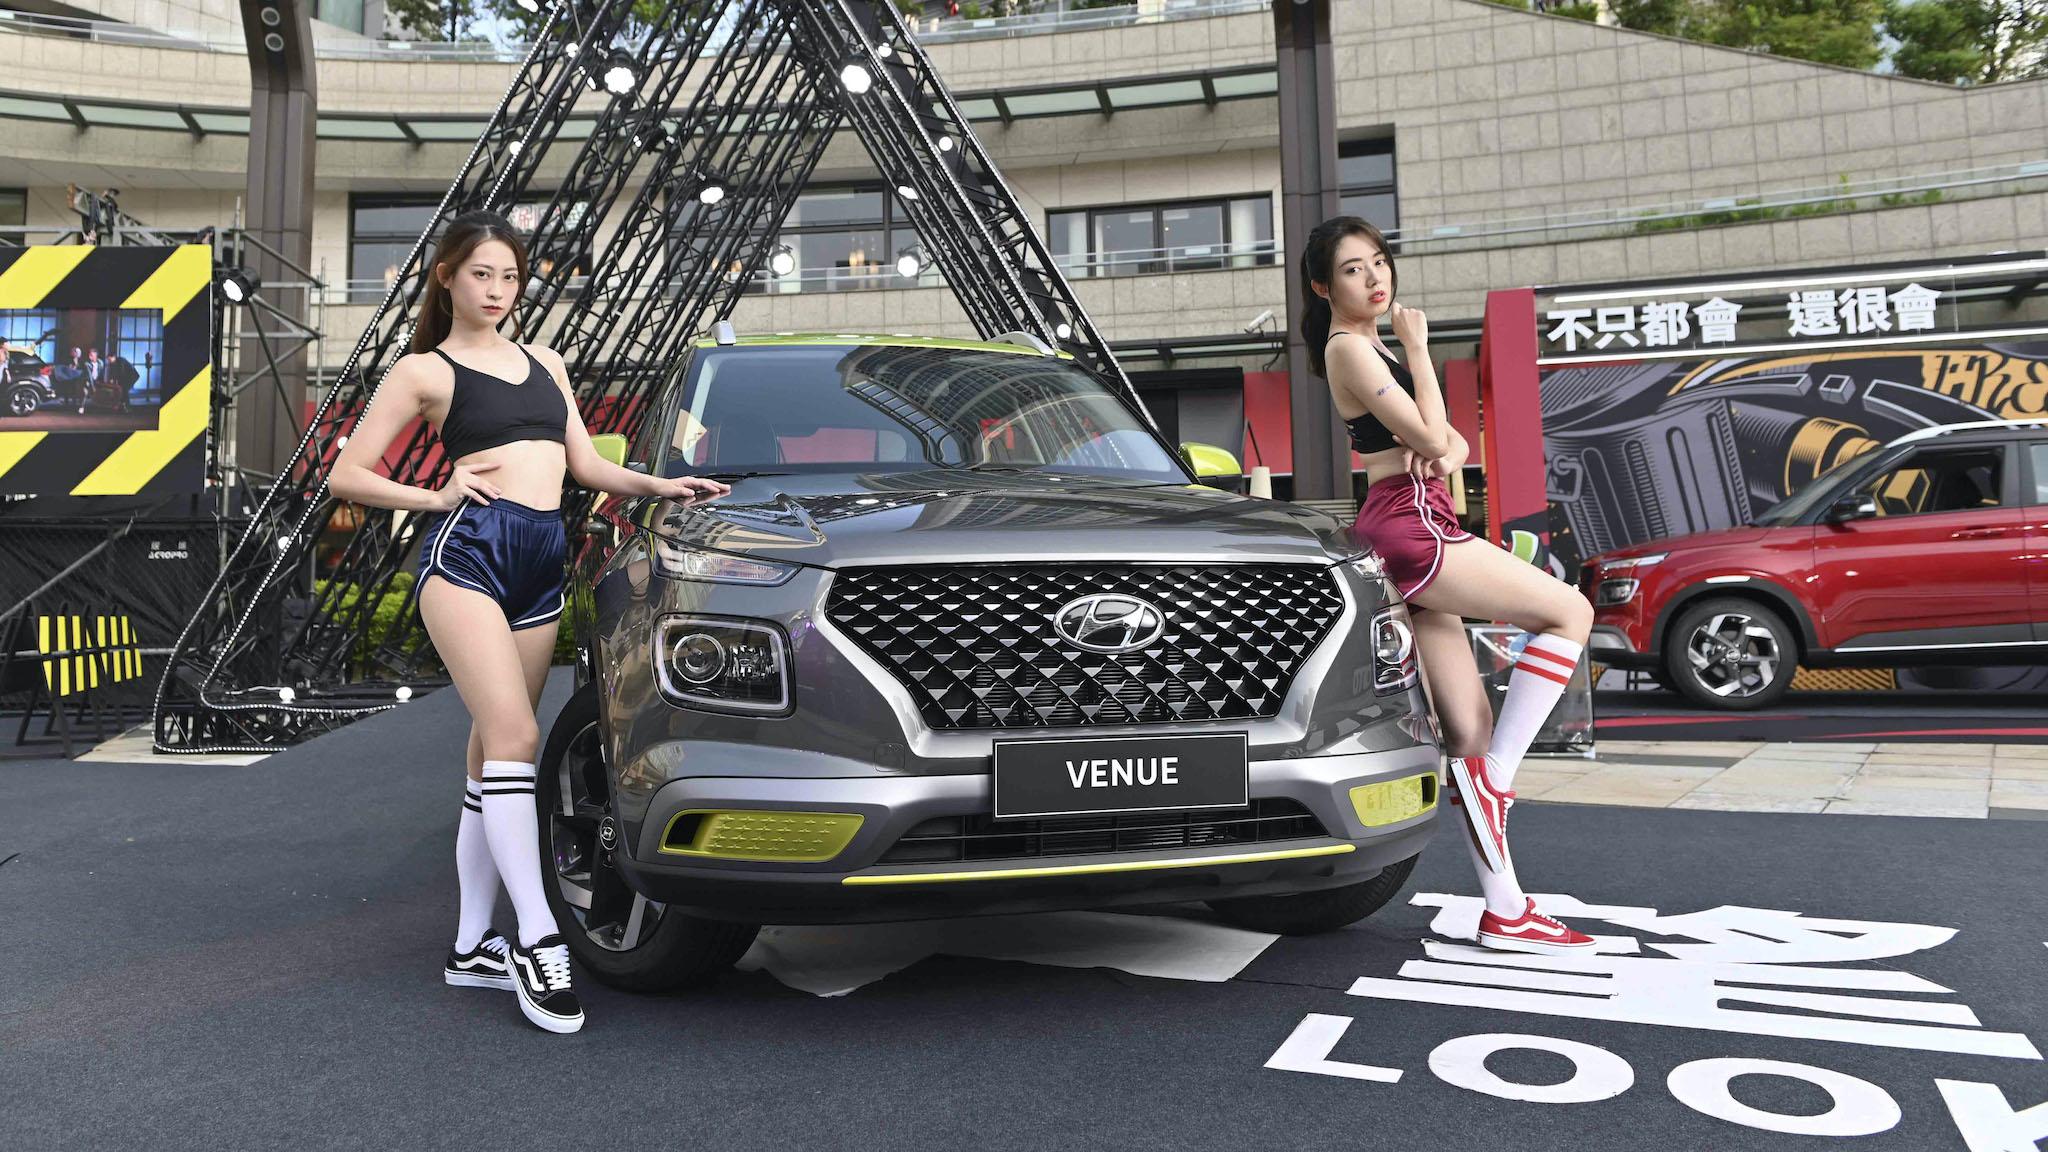 Hyundai Venue 三車型 65.9 萬起正式登場,詳細規格看這裡